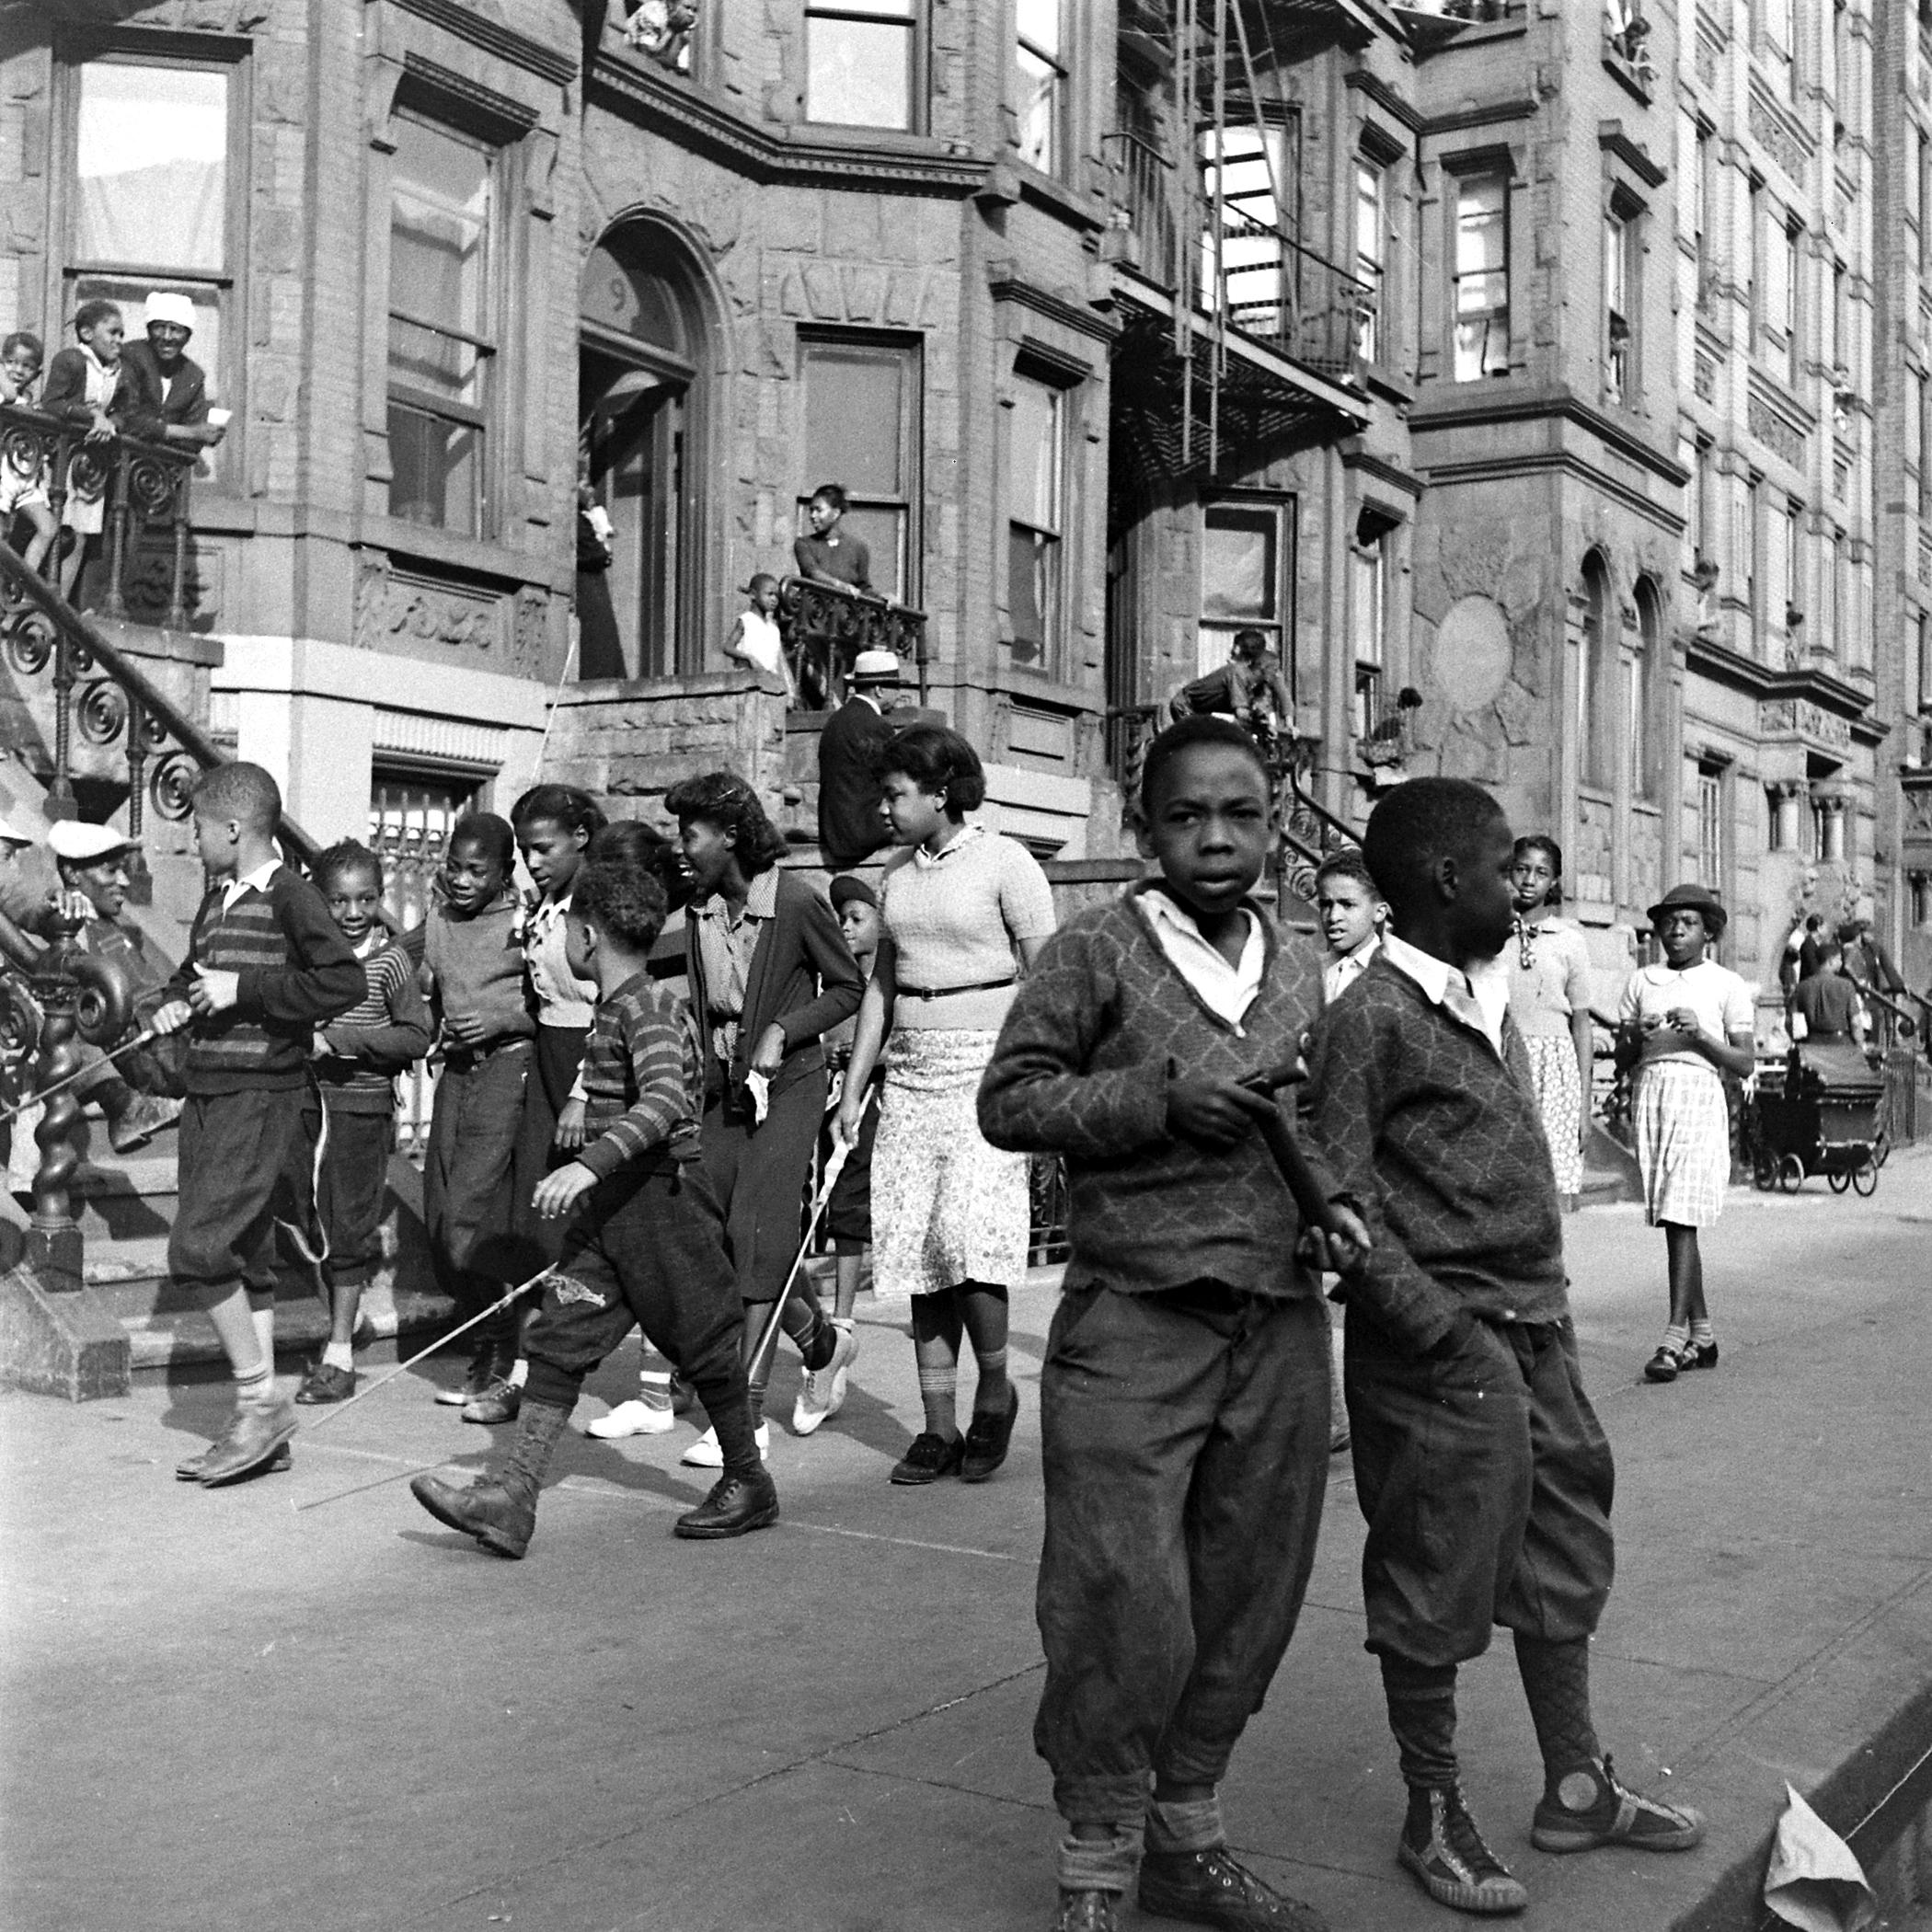 Children on a Harlem street, 1938.